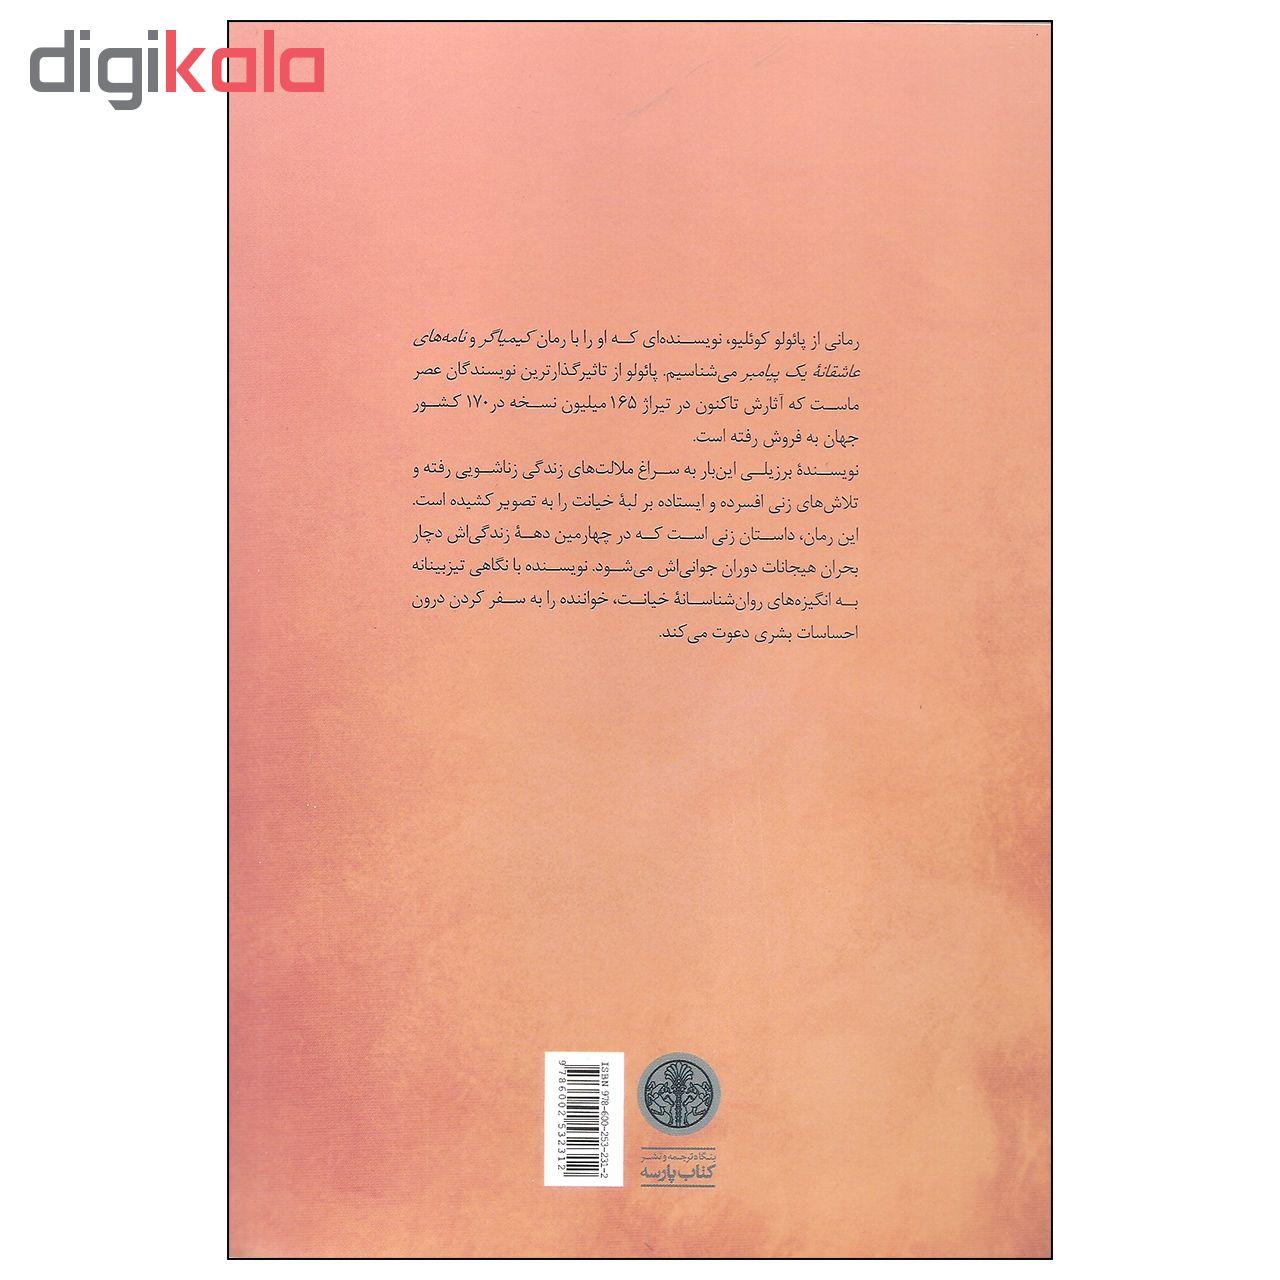 خرید                      کتاب خیانت اثر پائولو کوئلیو انتشارات کتاب پارسه